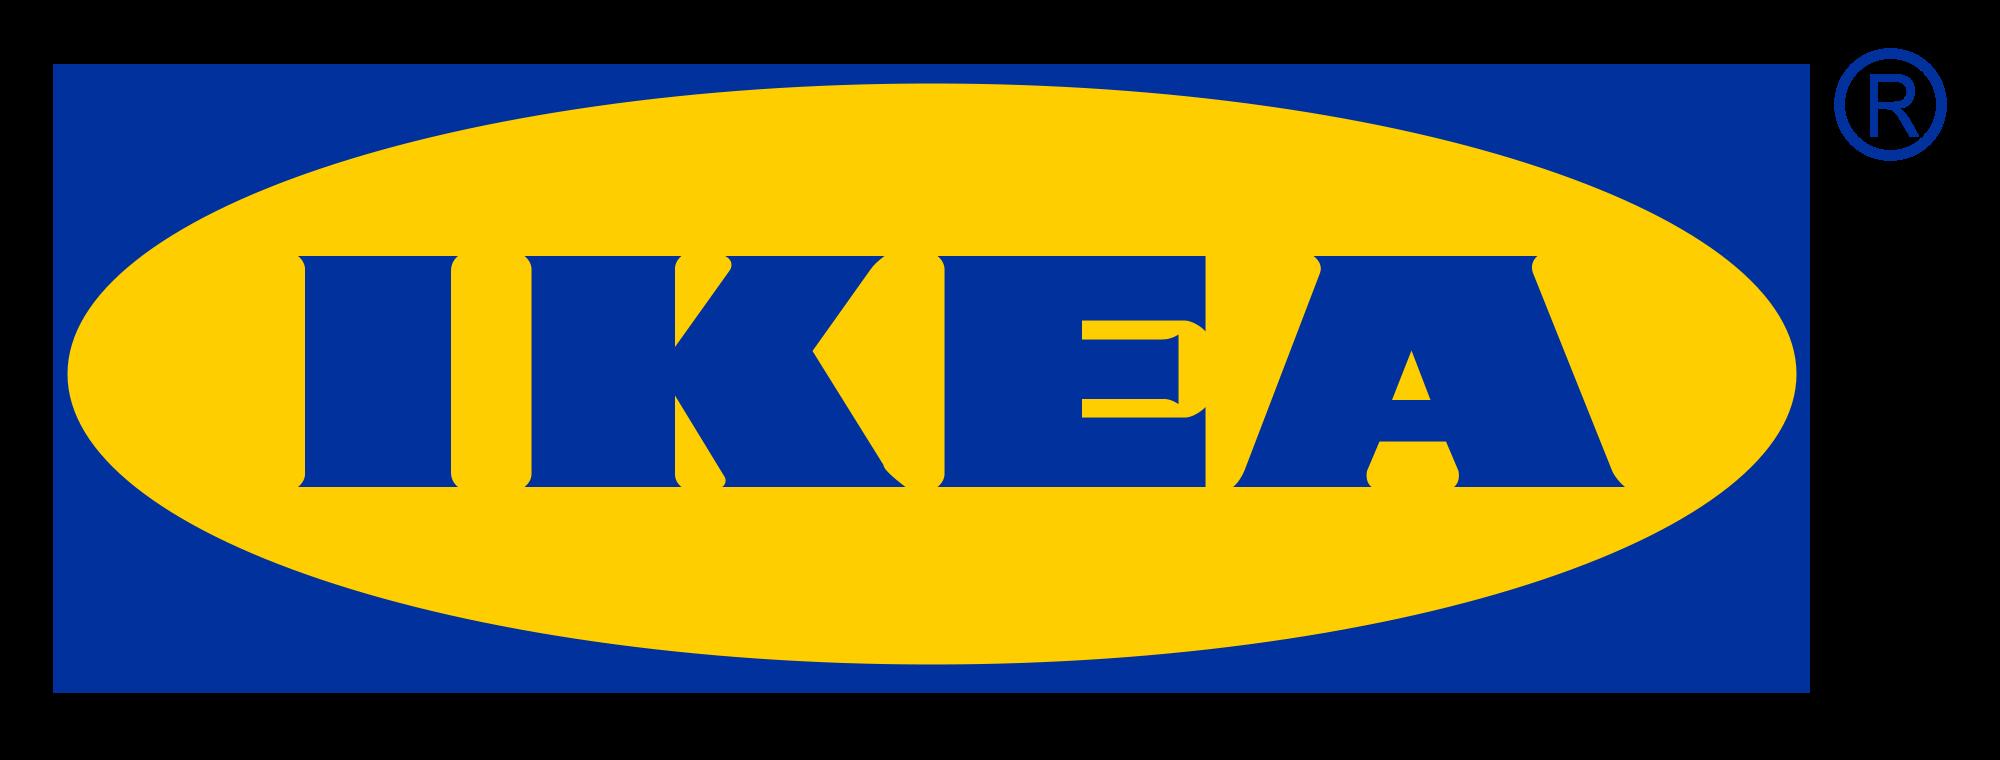 Lalamove partnered with Ikea